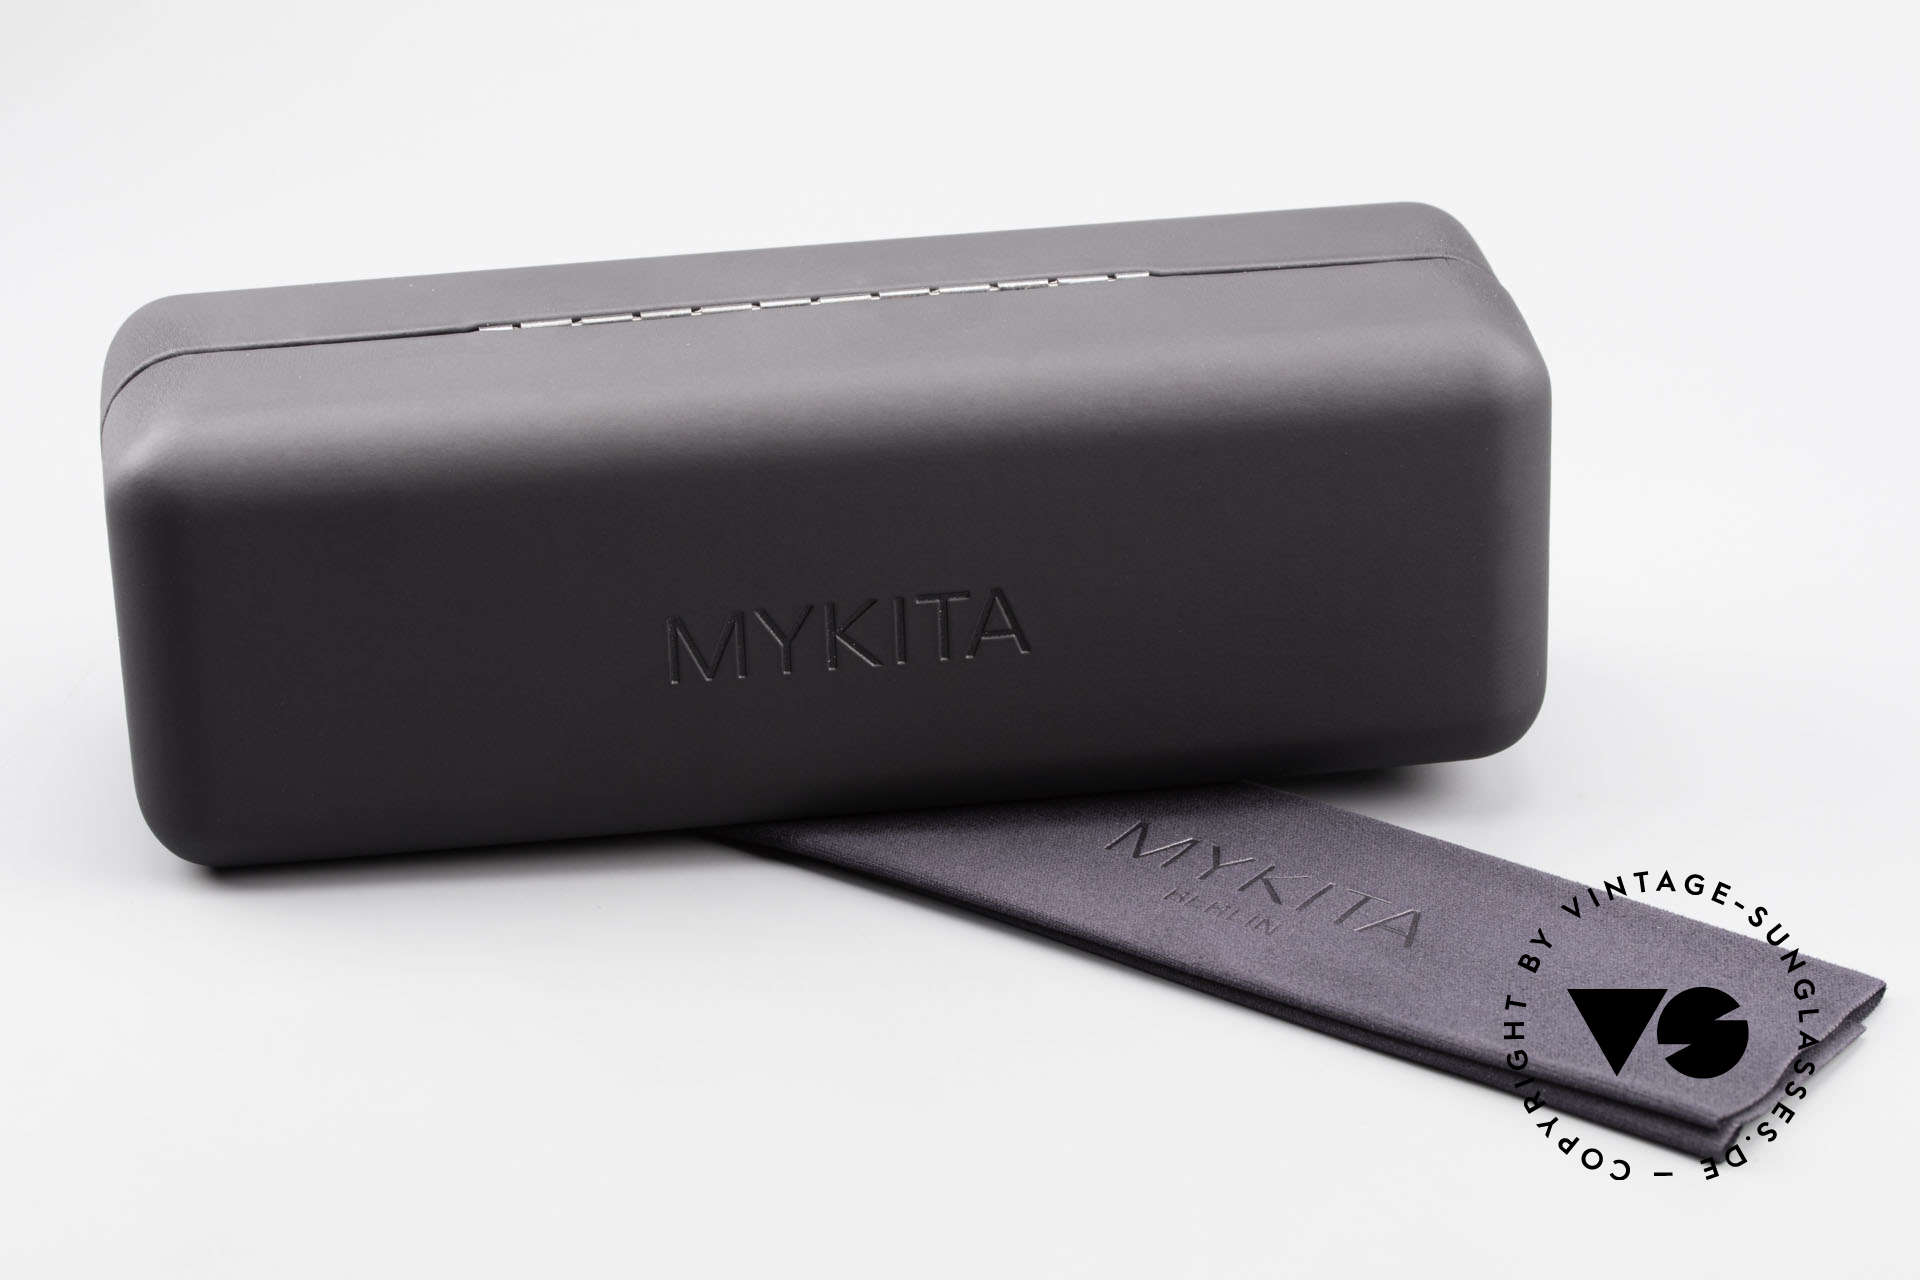 Mykita Howard Vintage Unisex Mykita Shades, Size: large, Made for Men and Women